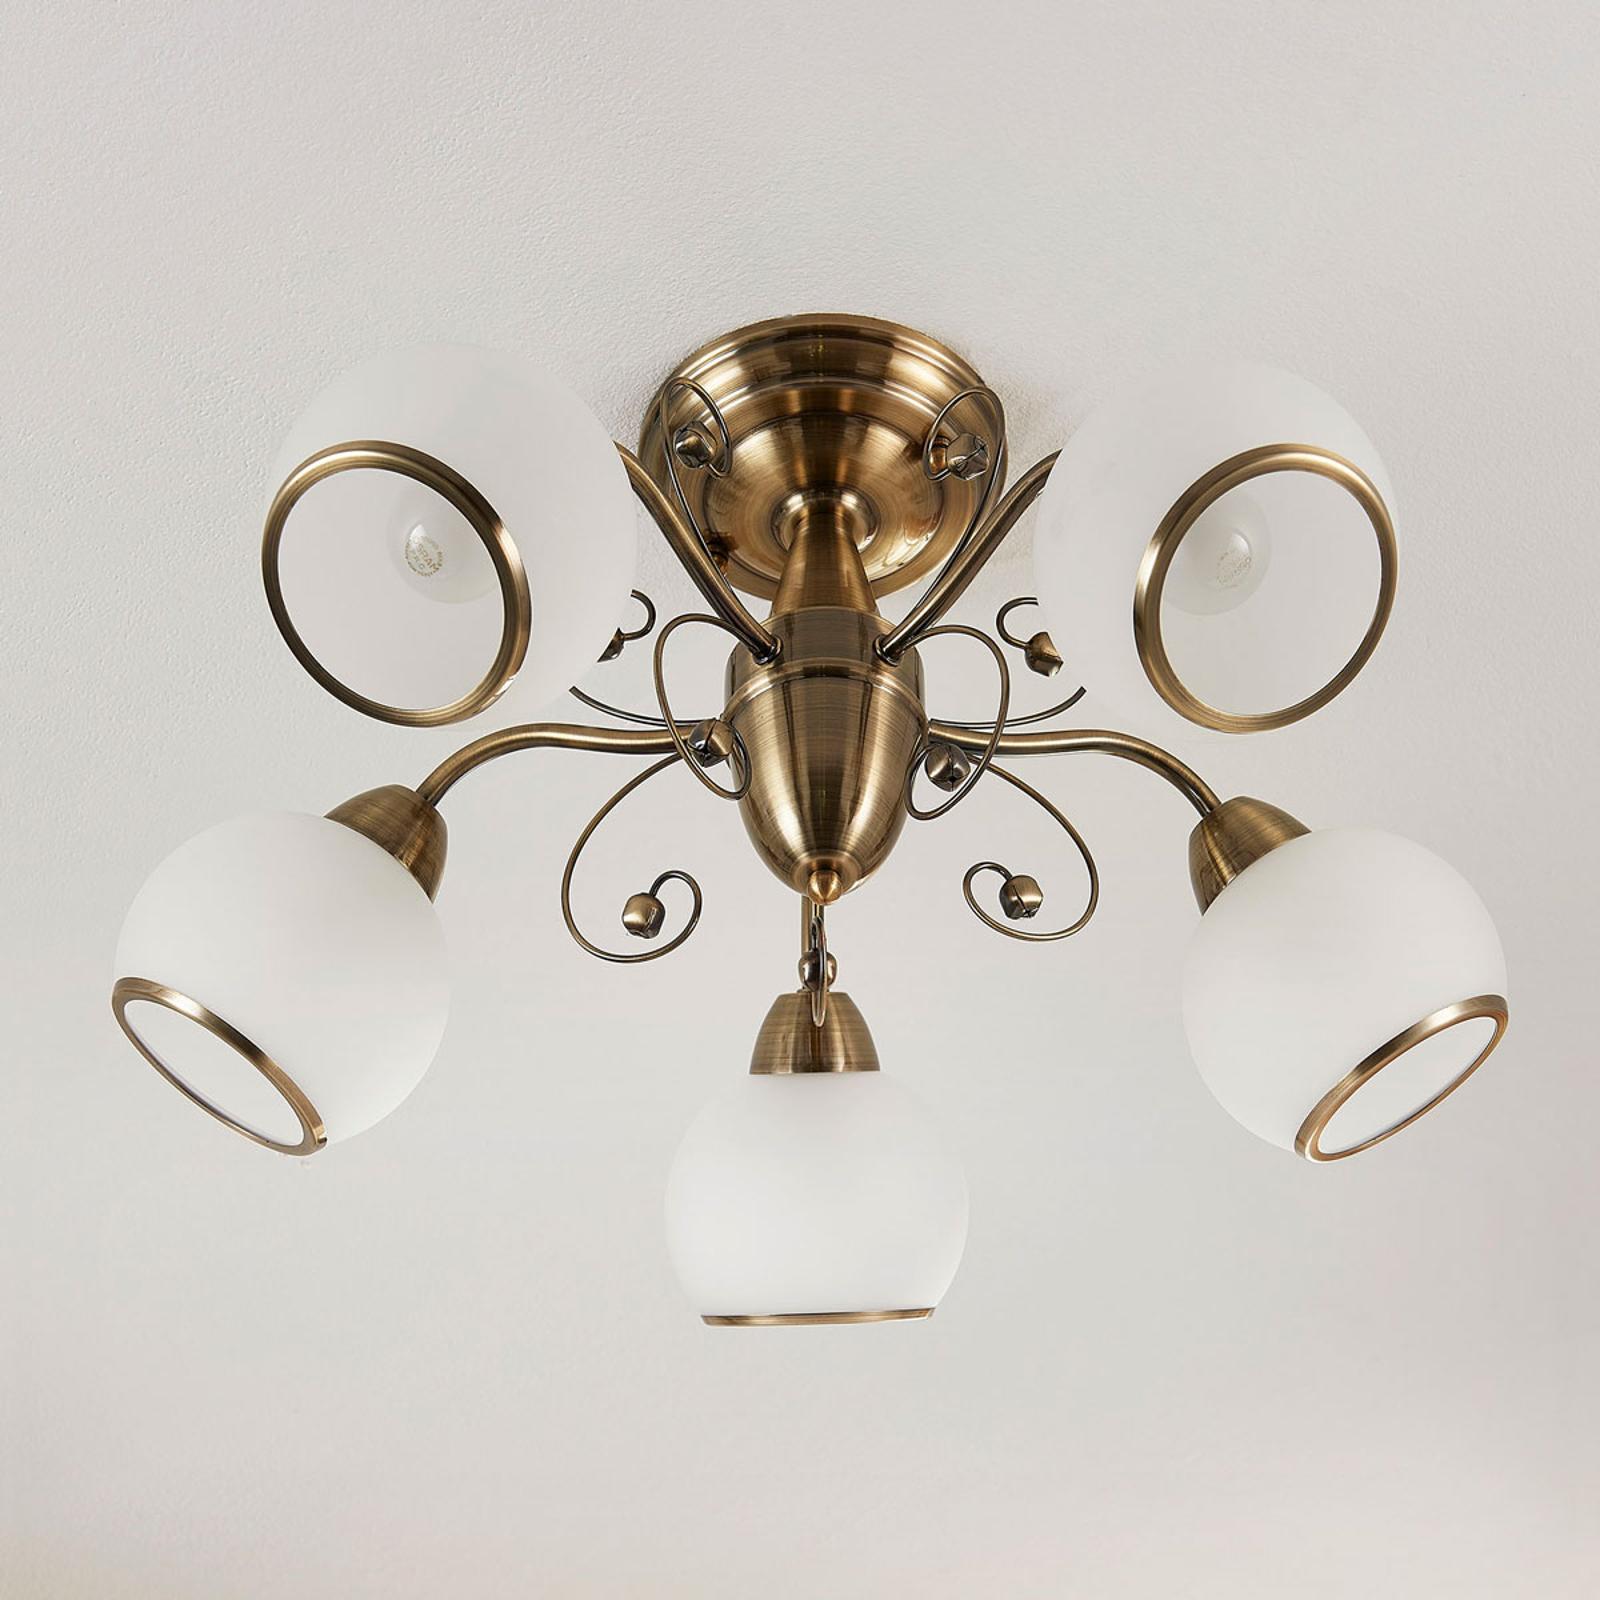 Fabelachtige plafondlamp Corentin, oudmessing